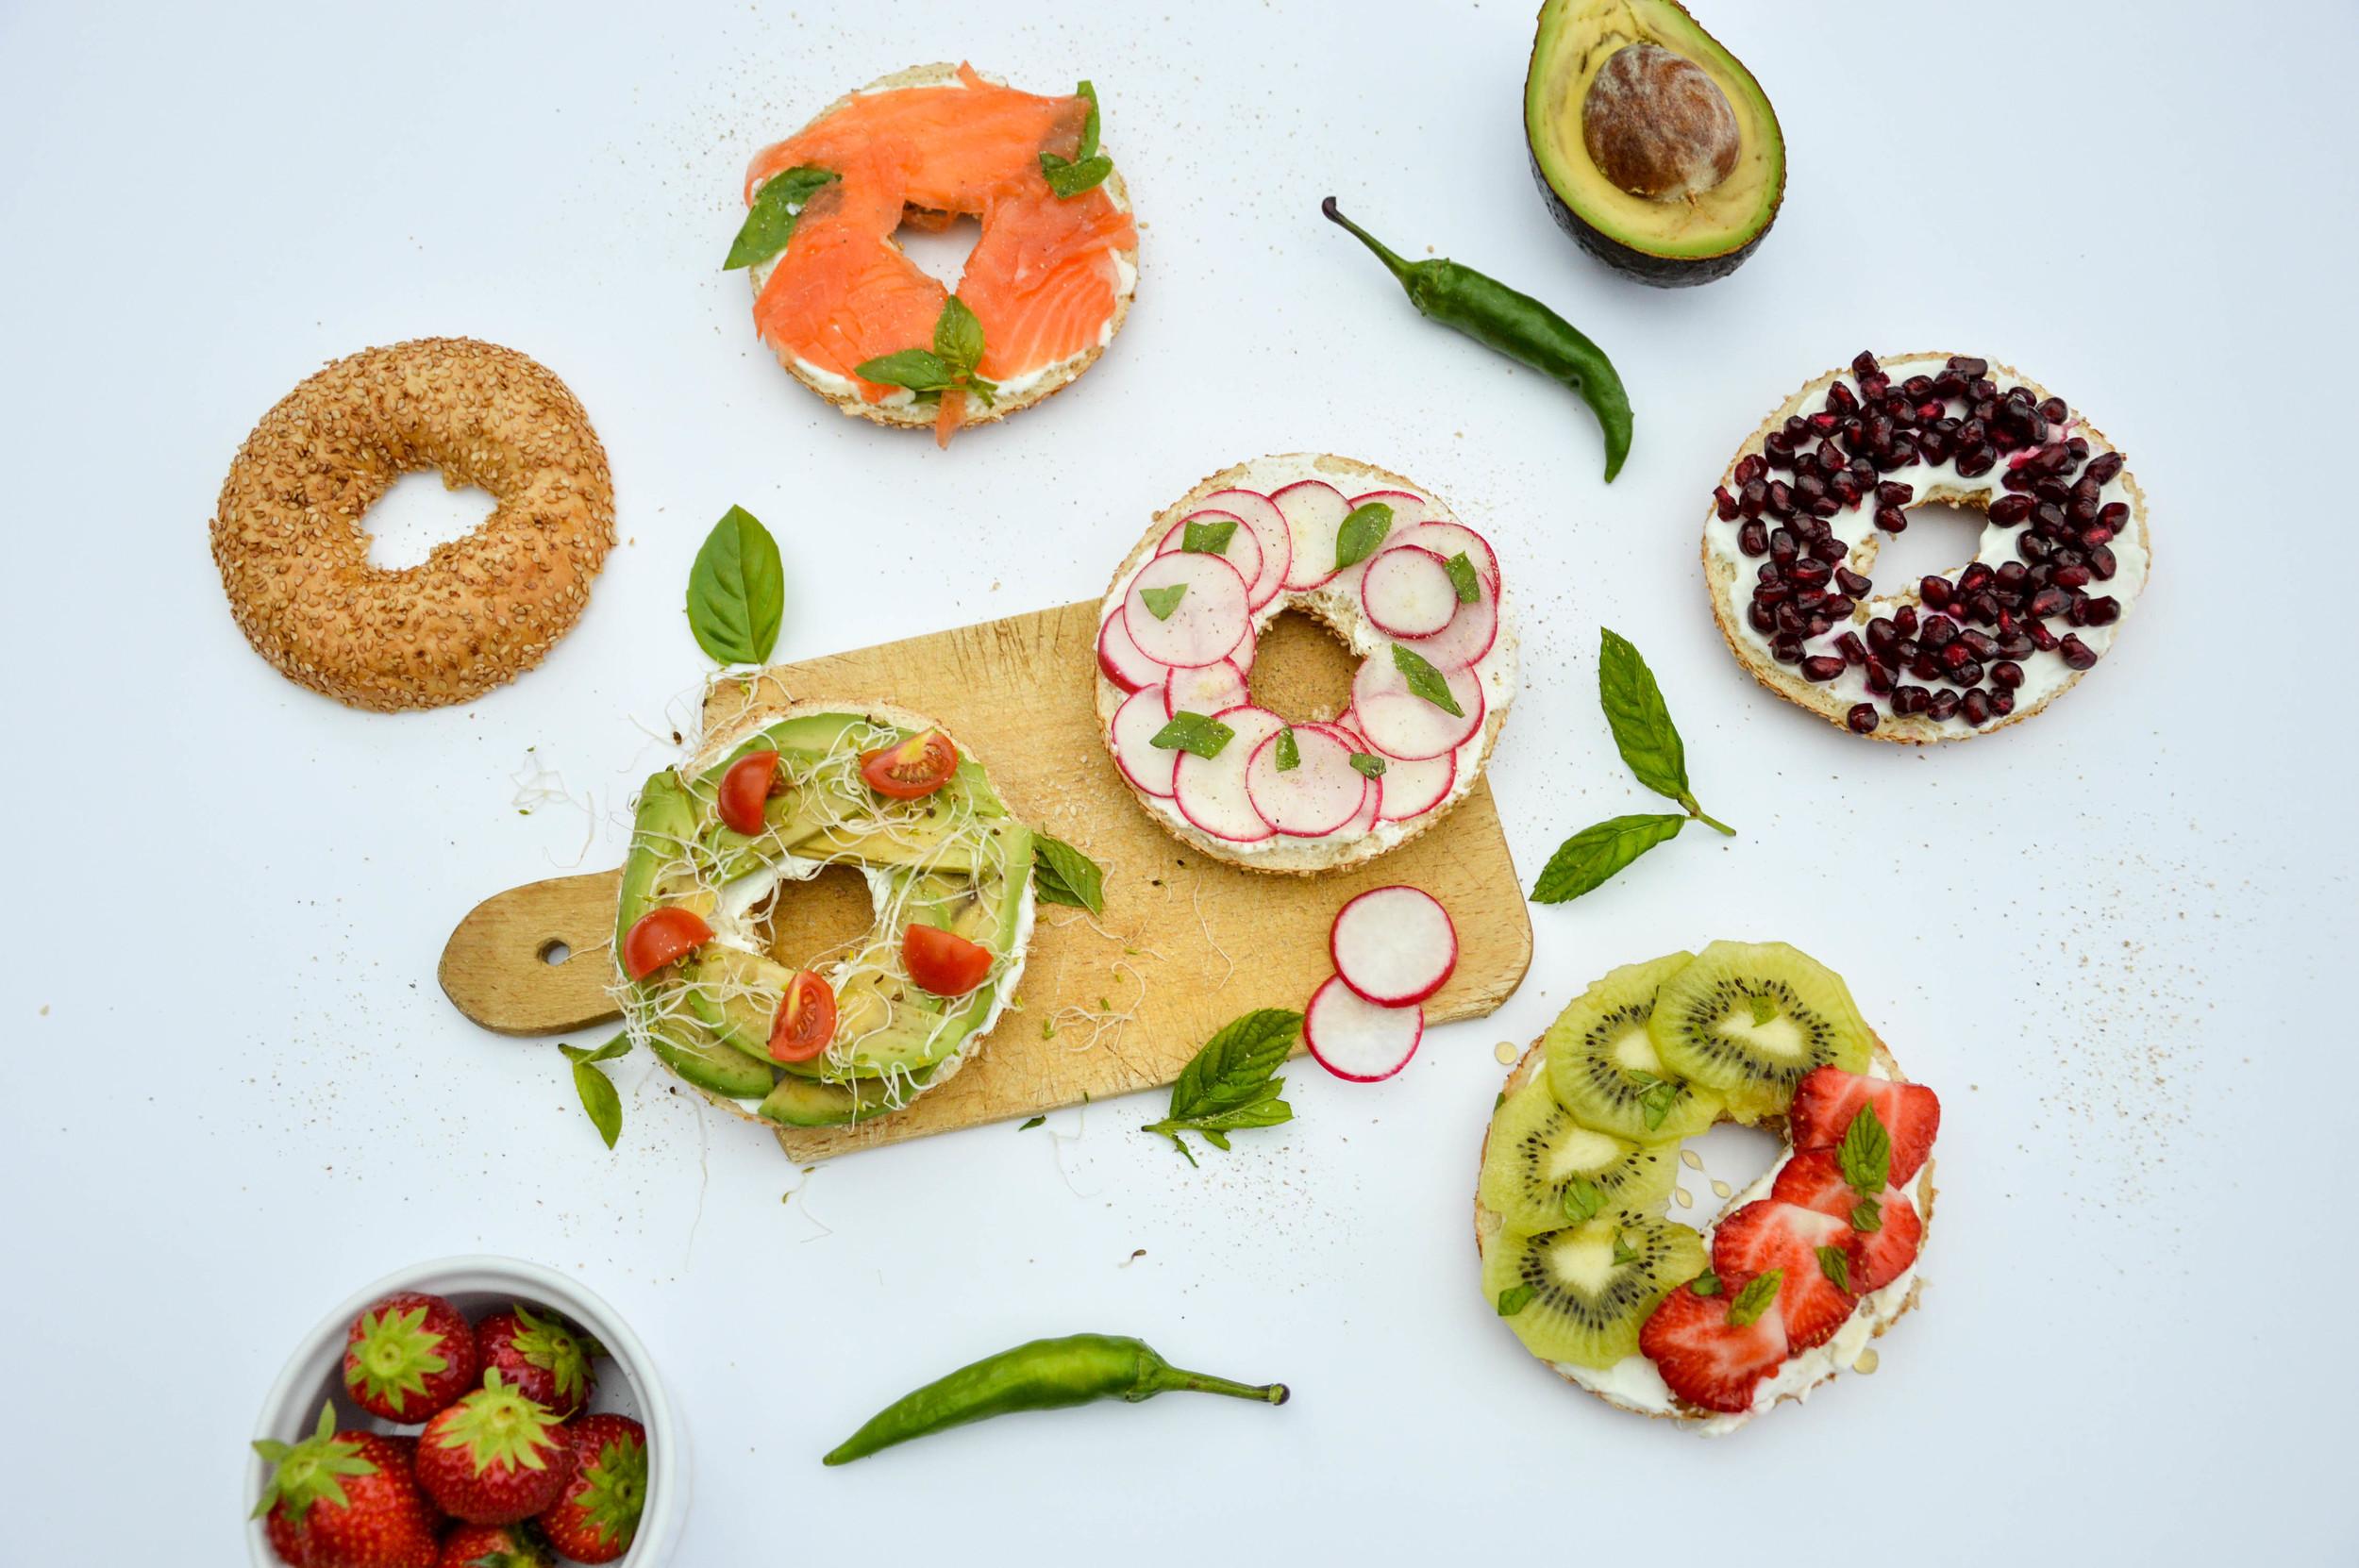 Healthy Bagels - OSIARAH.COM (8 of 8).jpg